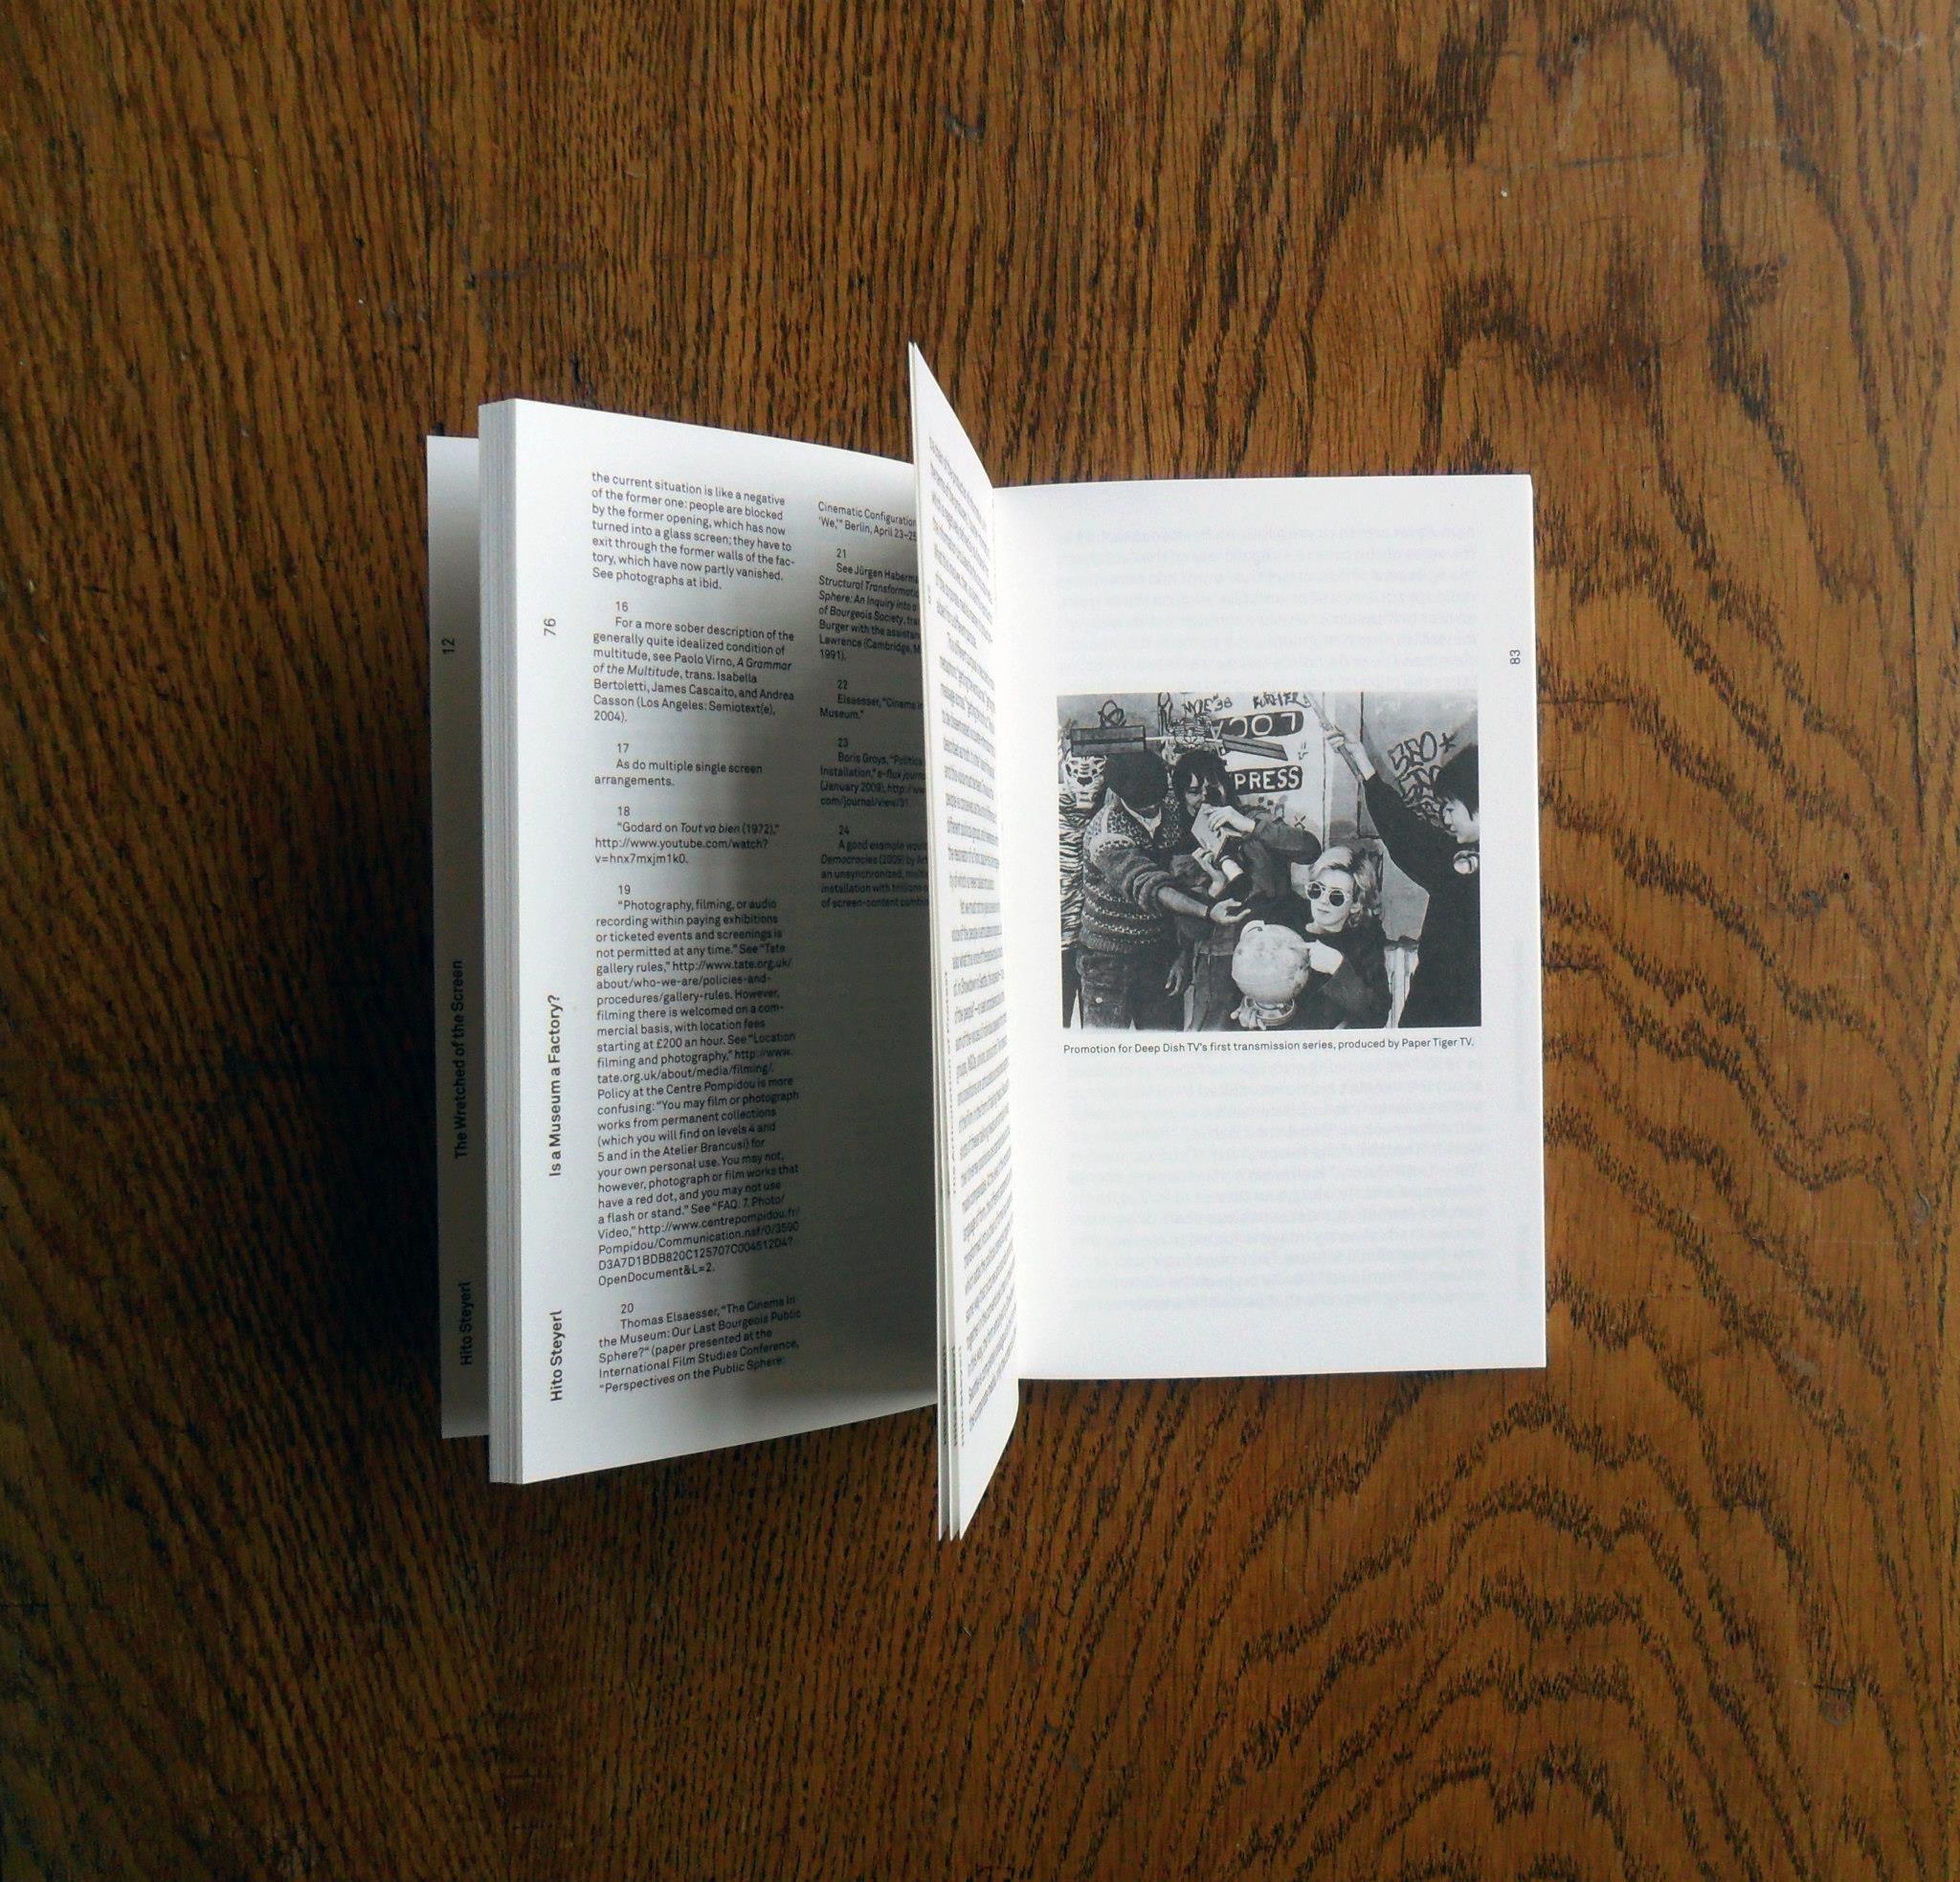 Wretched Screen, Sternberg Polaroid film, Film, Screen